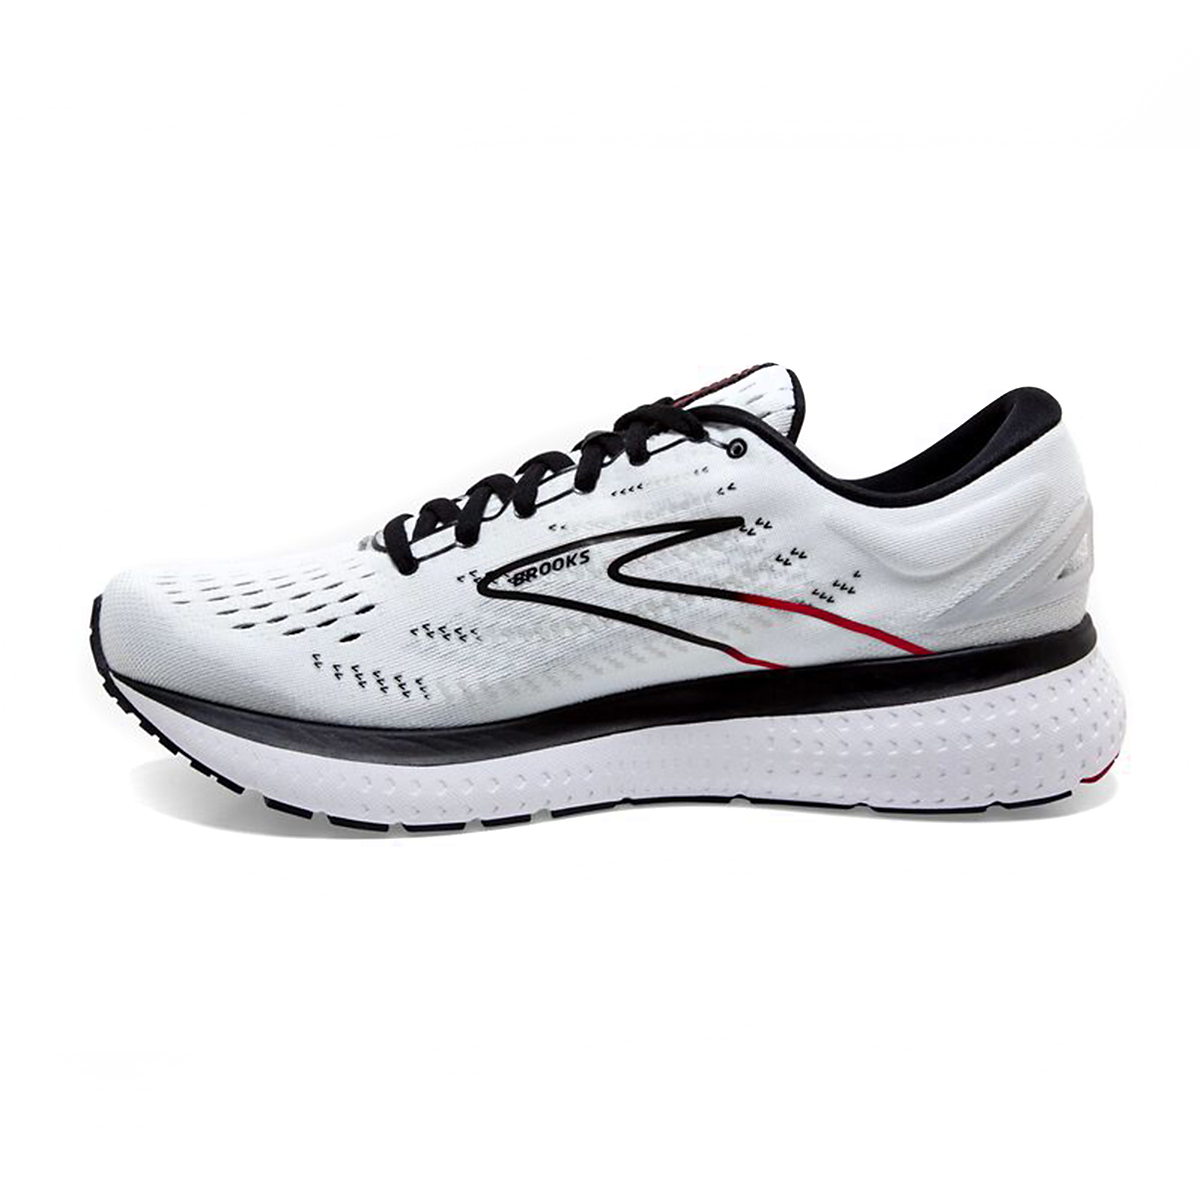 Men's Brooks Glycerin 19 Running Shoe - Color: White/Black/Red - Size: 7 - Width: Regular, White/Black/Red, large, image 2